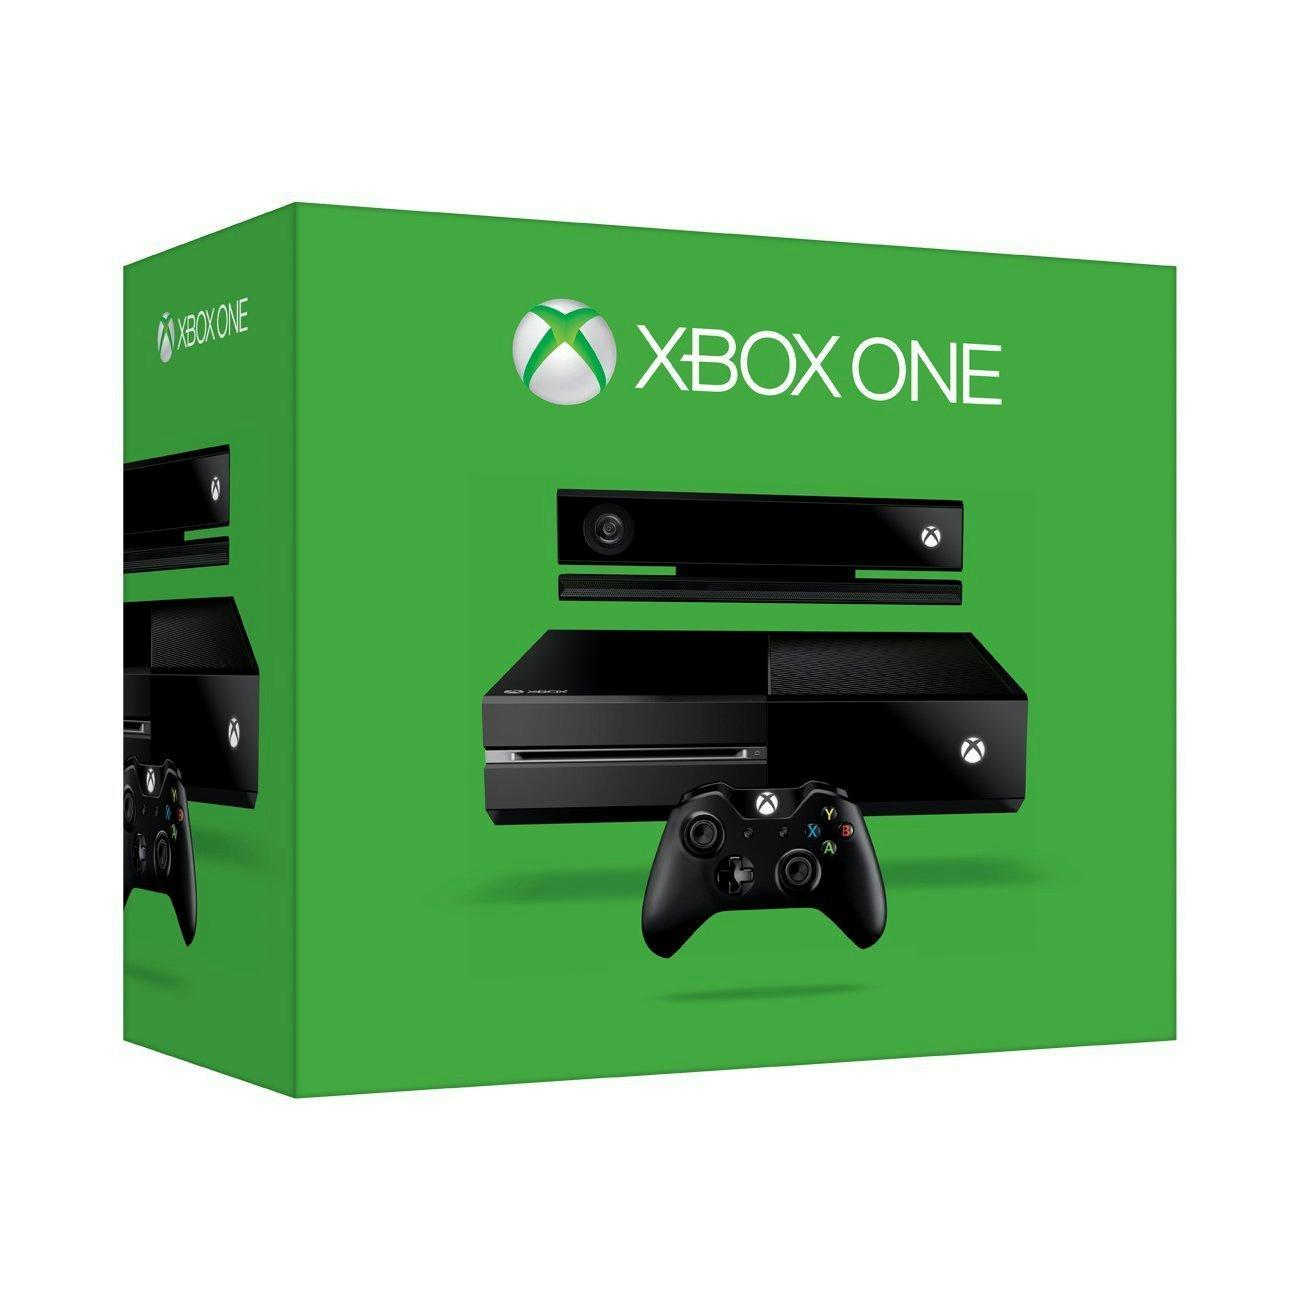 Microsoft Xbox One 500GB Console With Kinect Black EBay